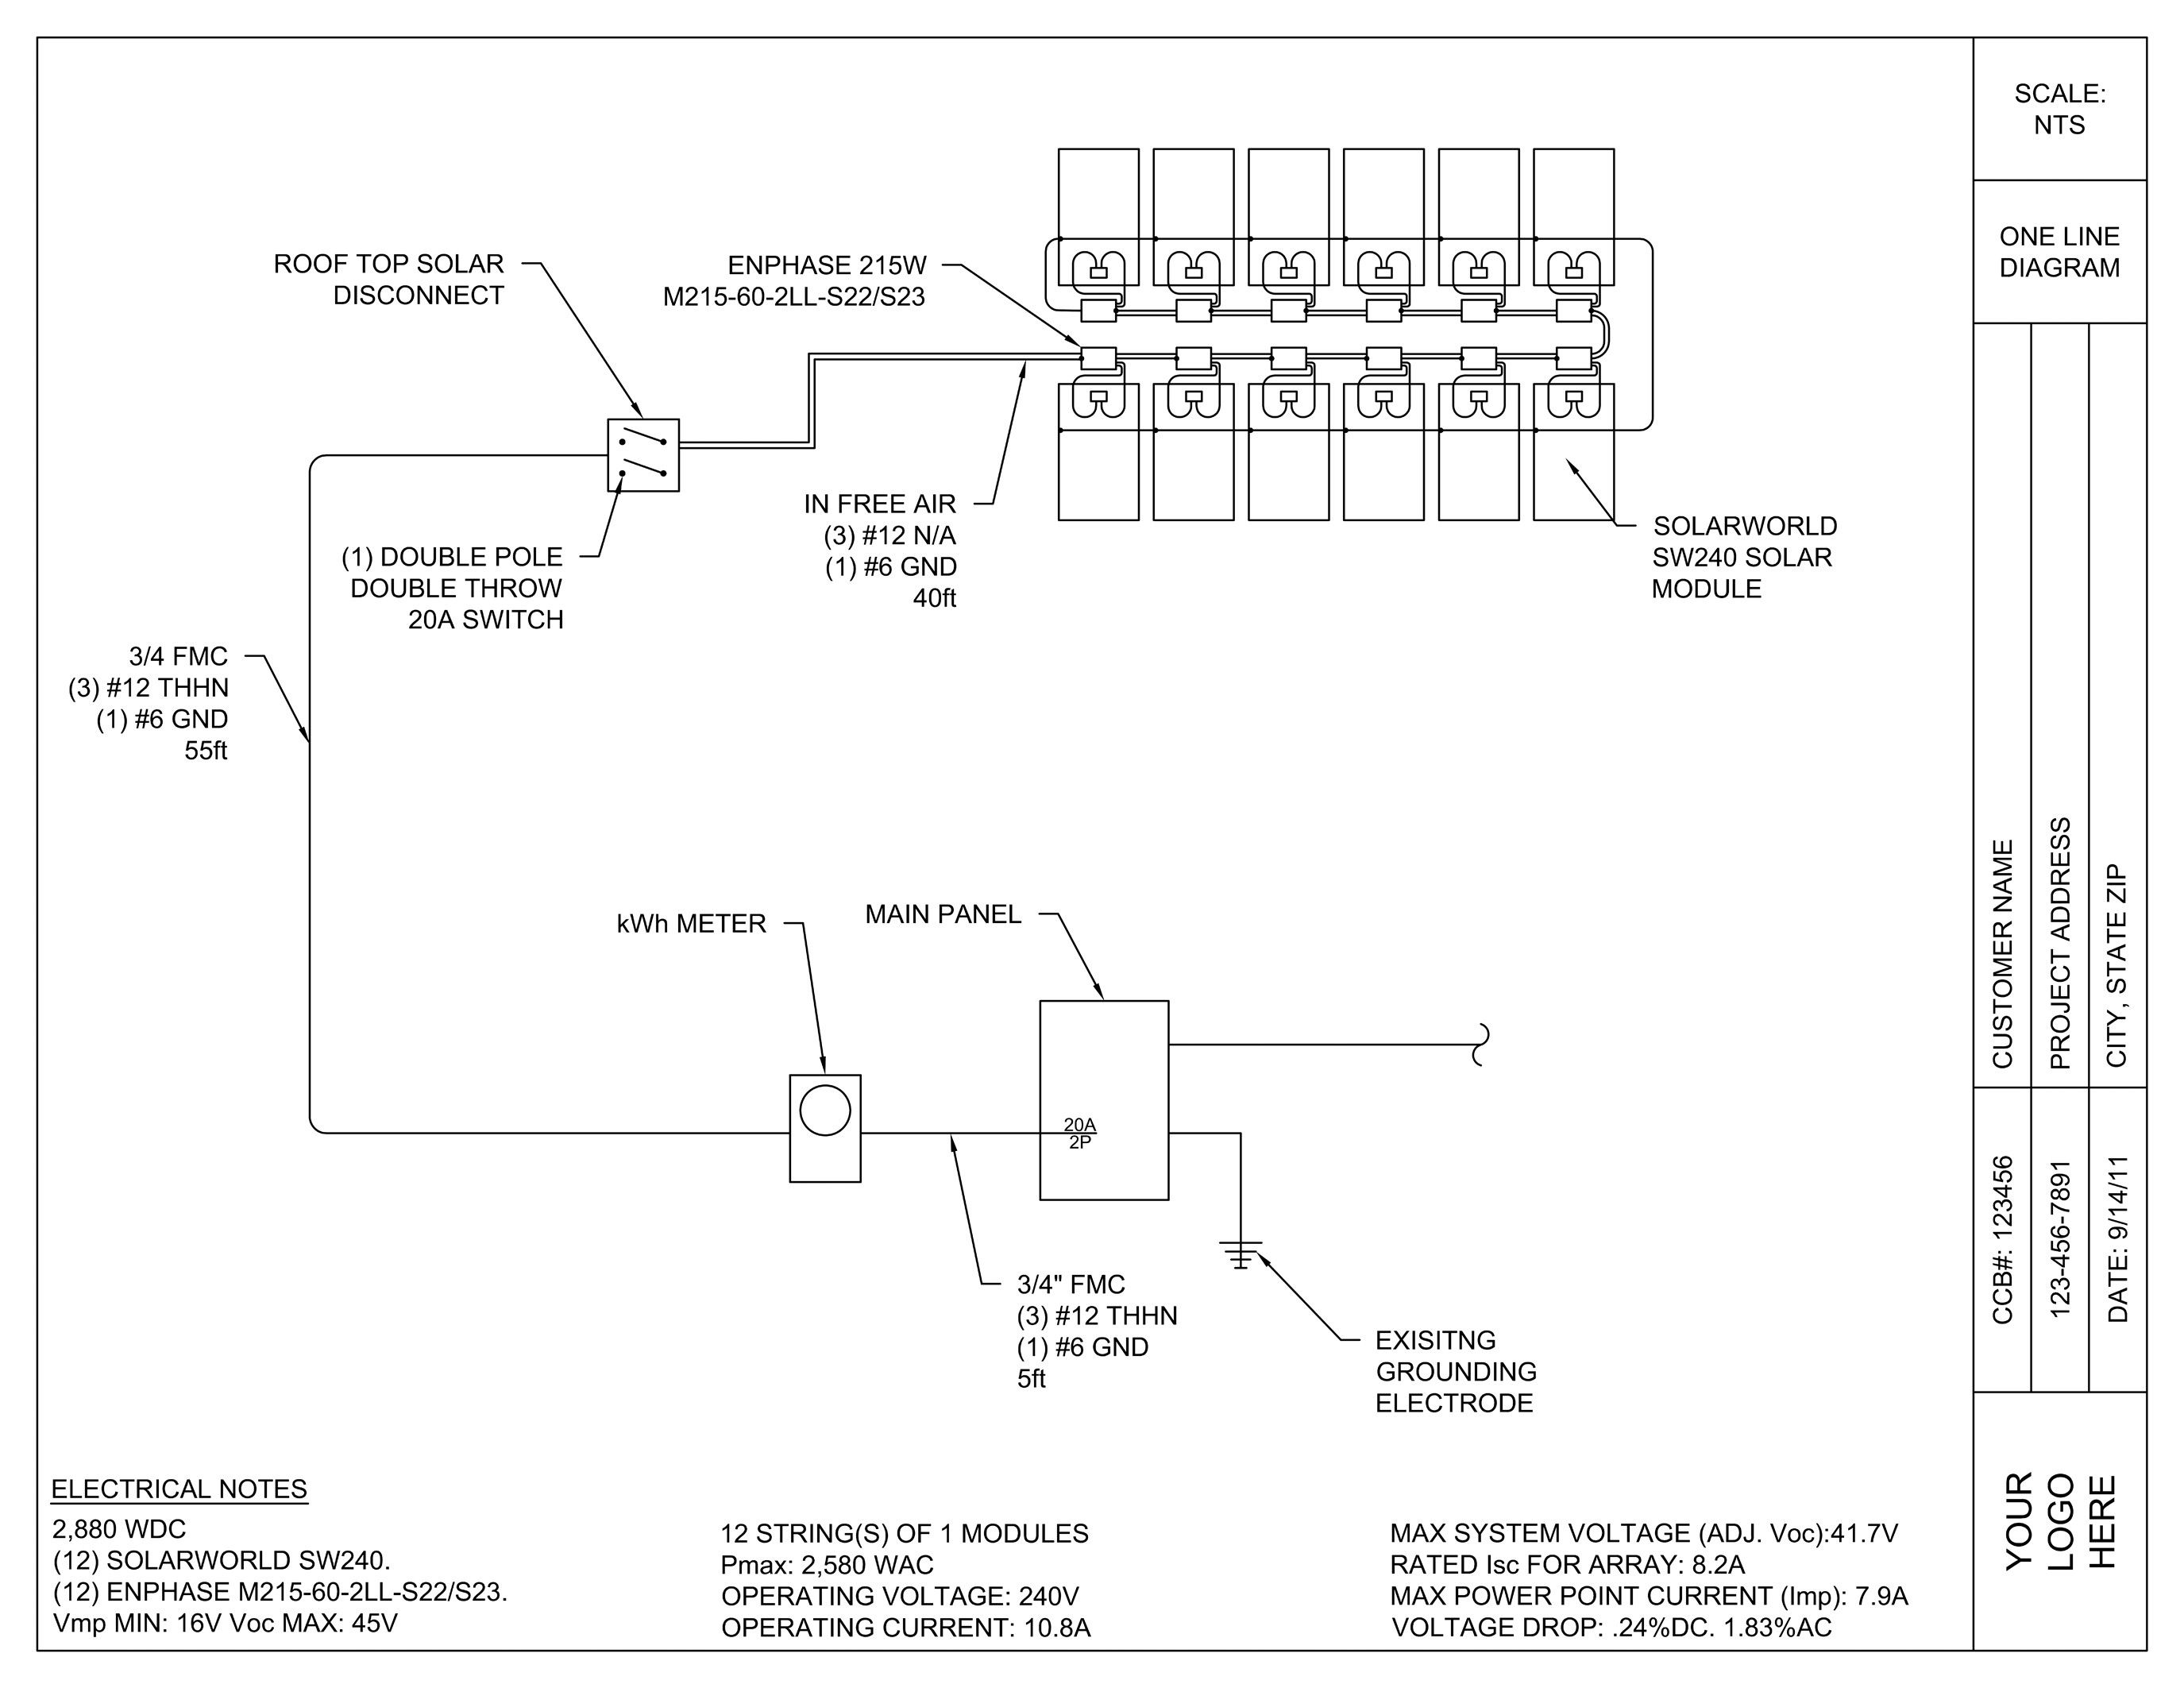 Unique Electrical Riser Diagram Template Diagram Wiringdiagram Diagramming Diagramm Visuals Visualisation Graphical Diagram Templates Electricity